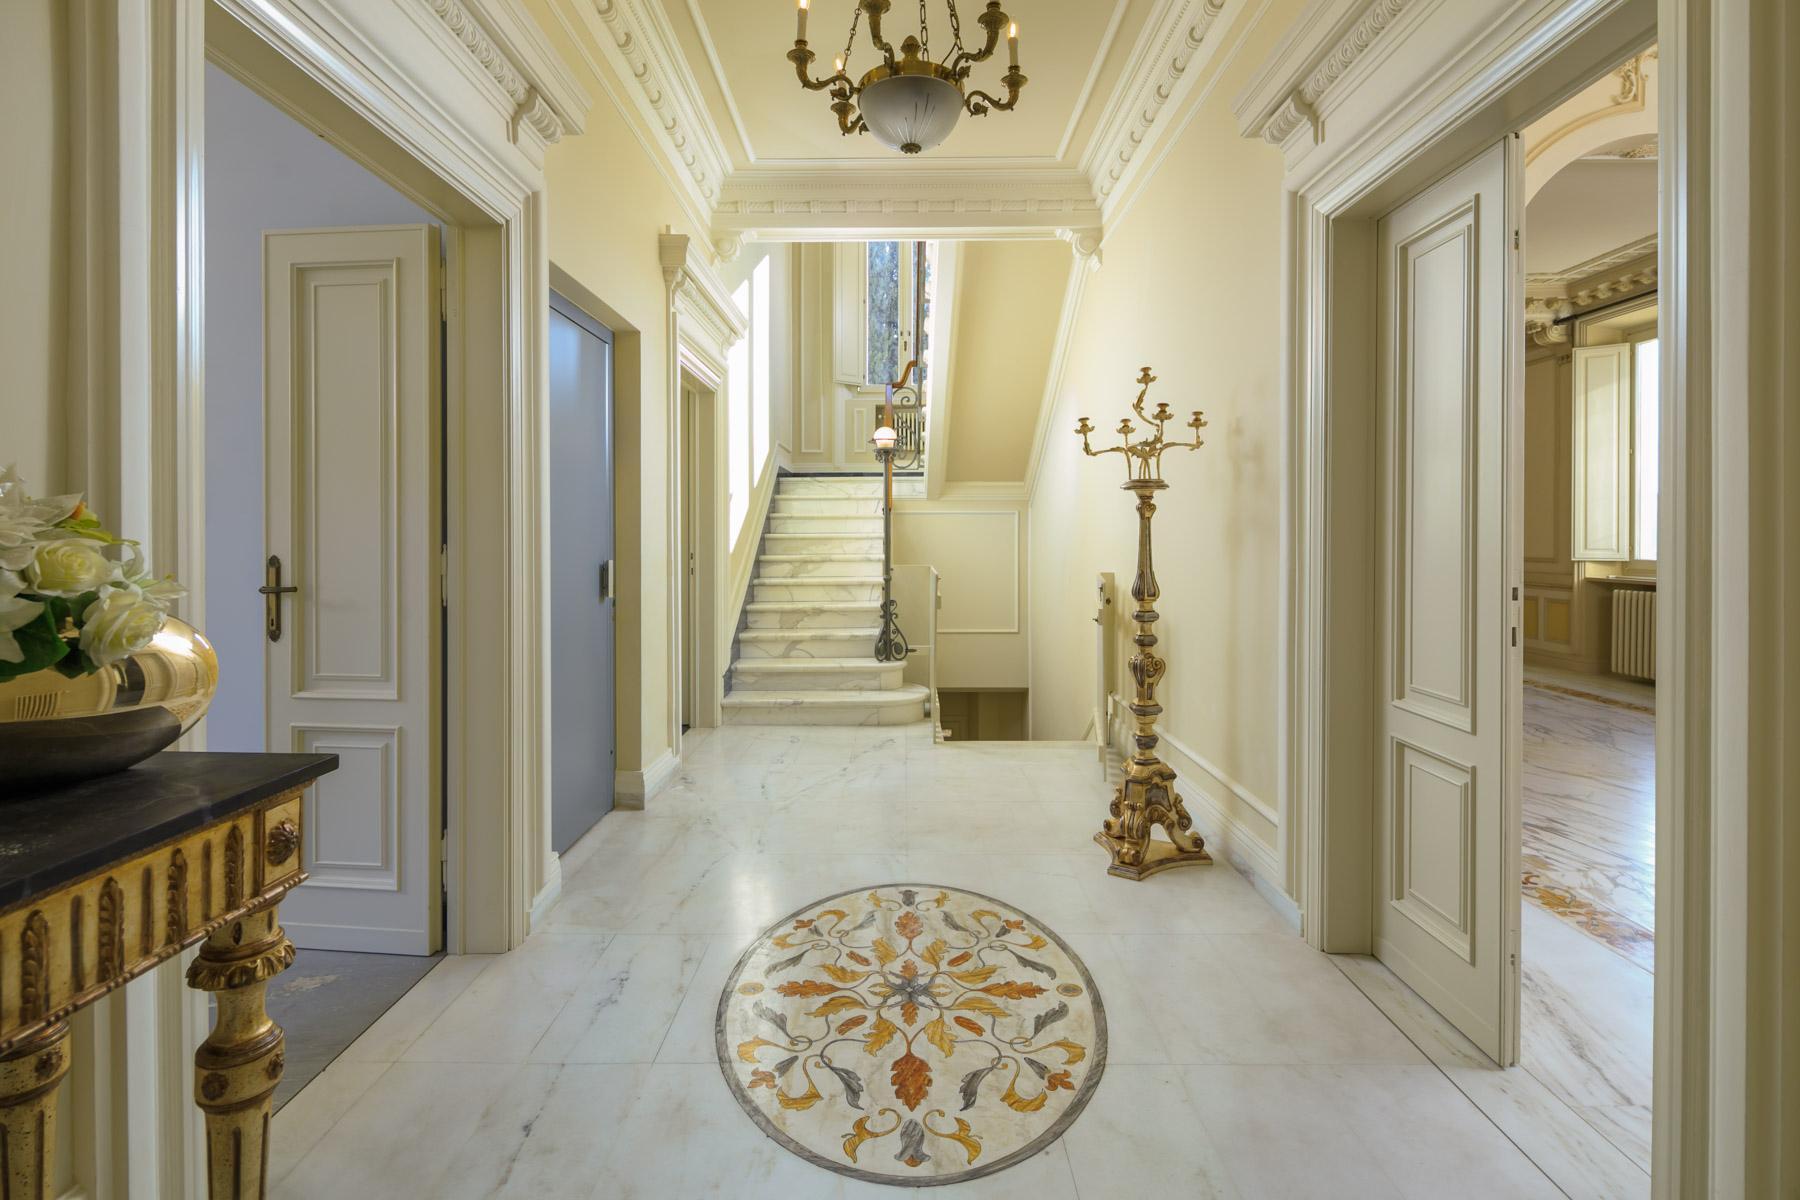 Montecatini Terme小镇优雅的新艺术风格的别墅 - 17